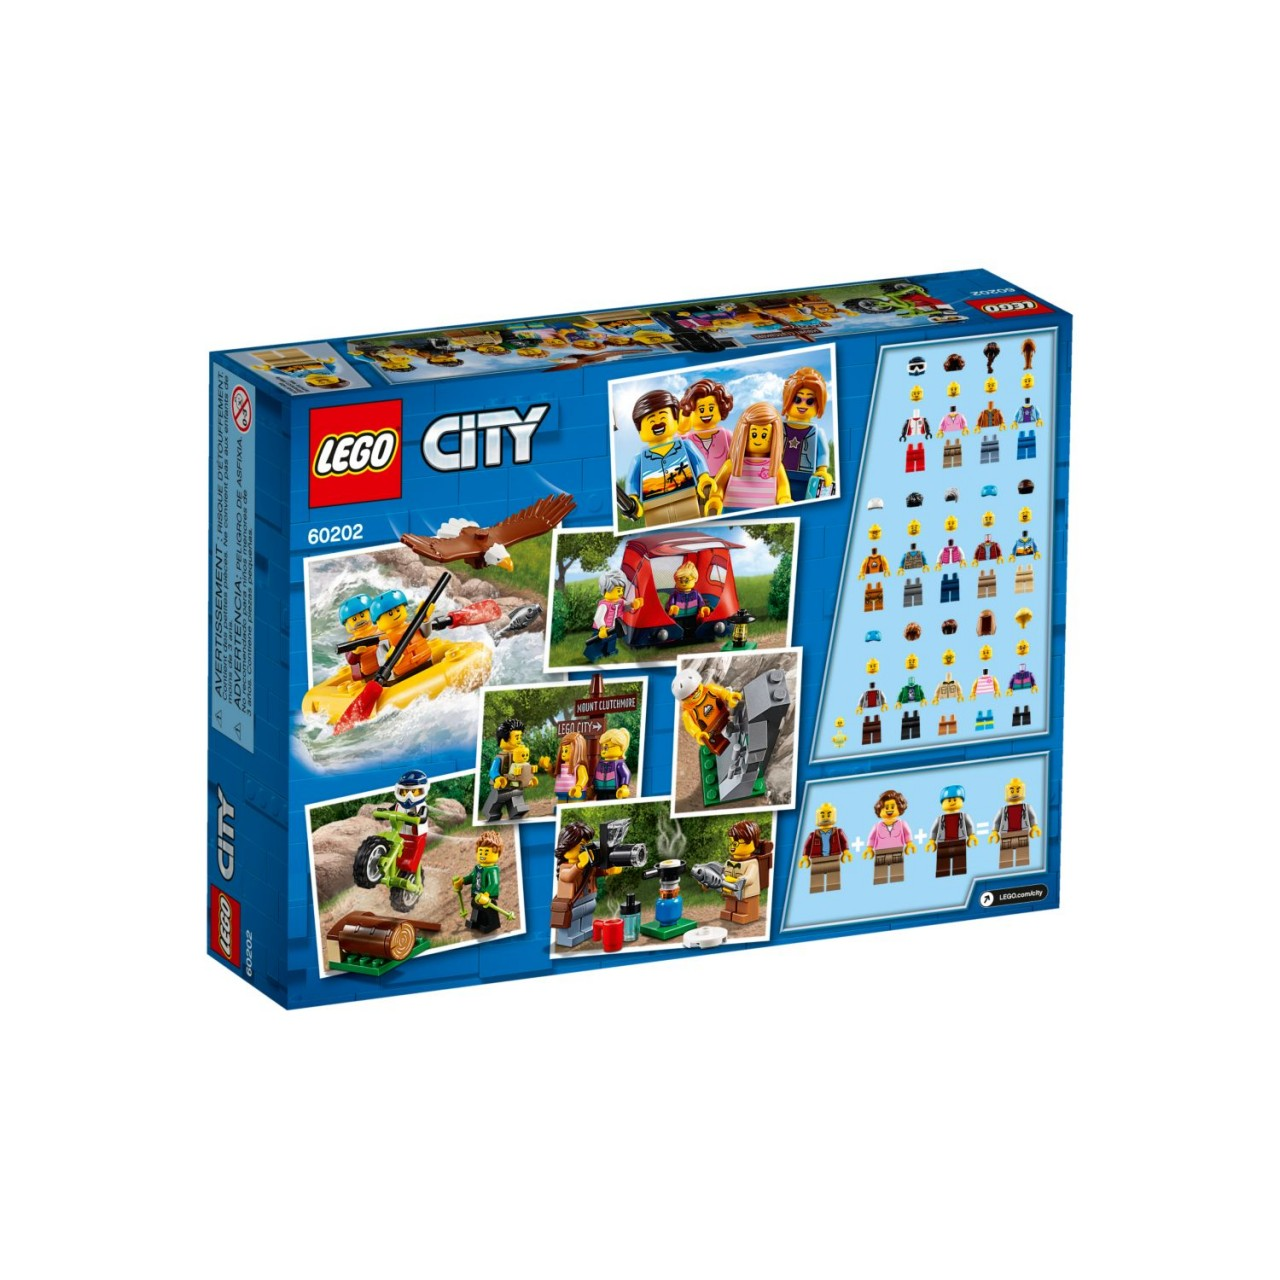 LEGO CITY 60202 Stadtbewohner